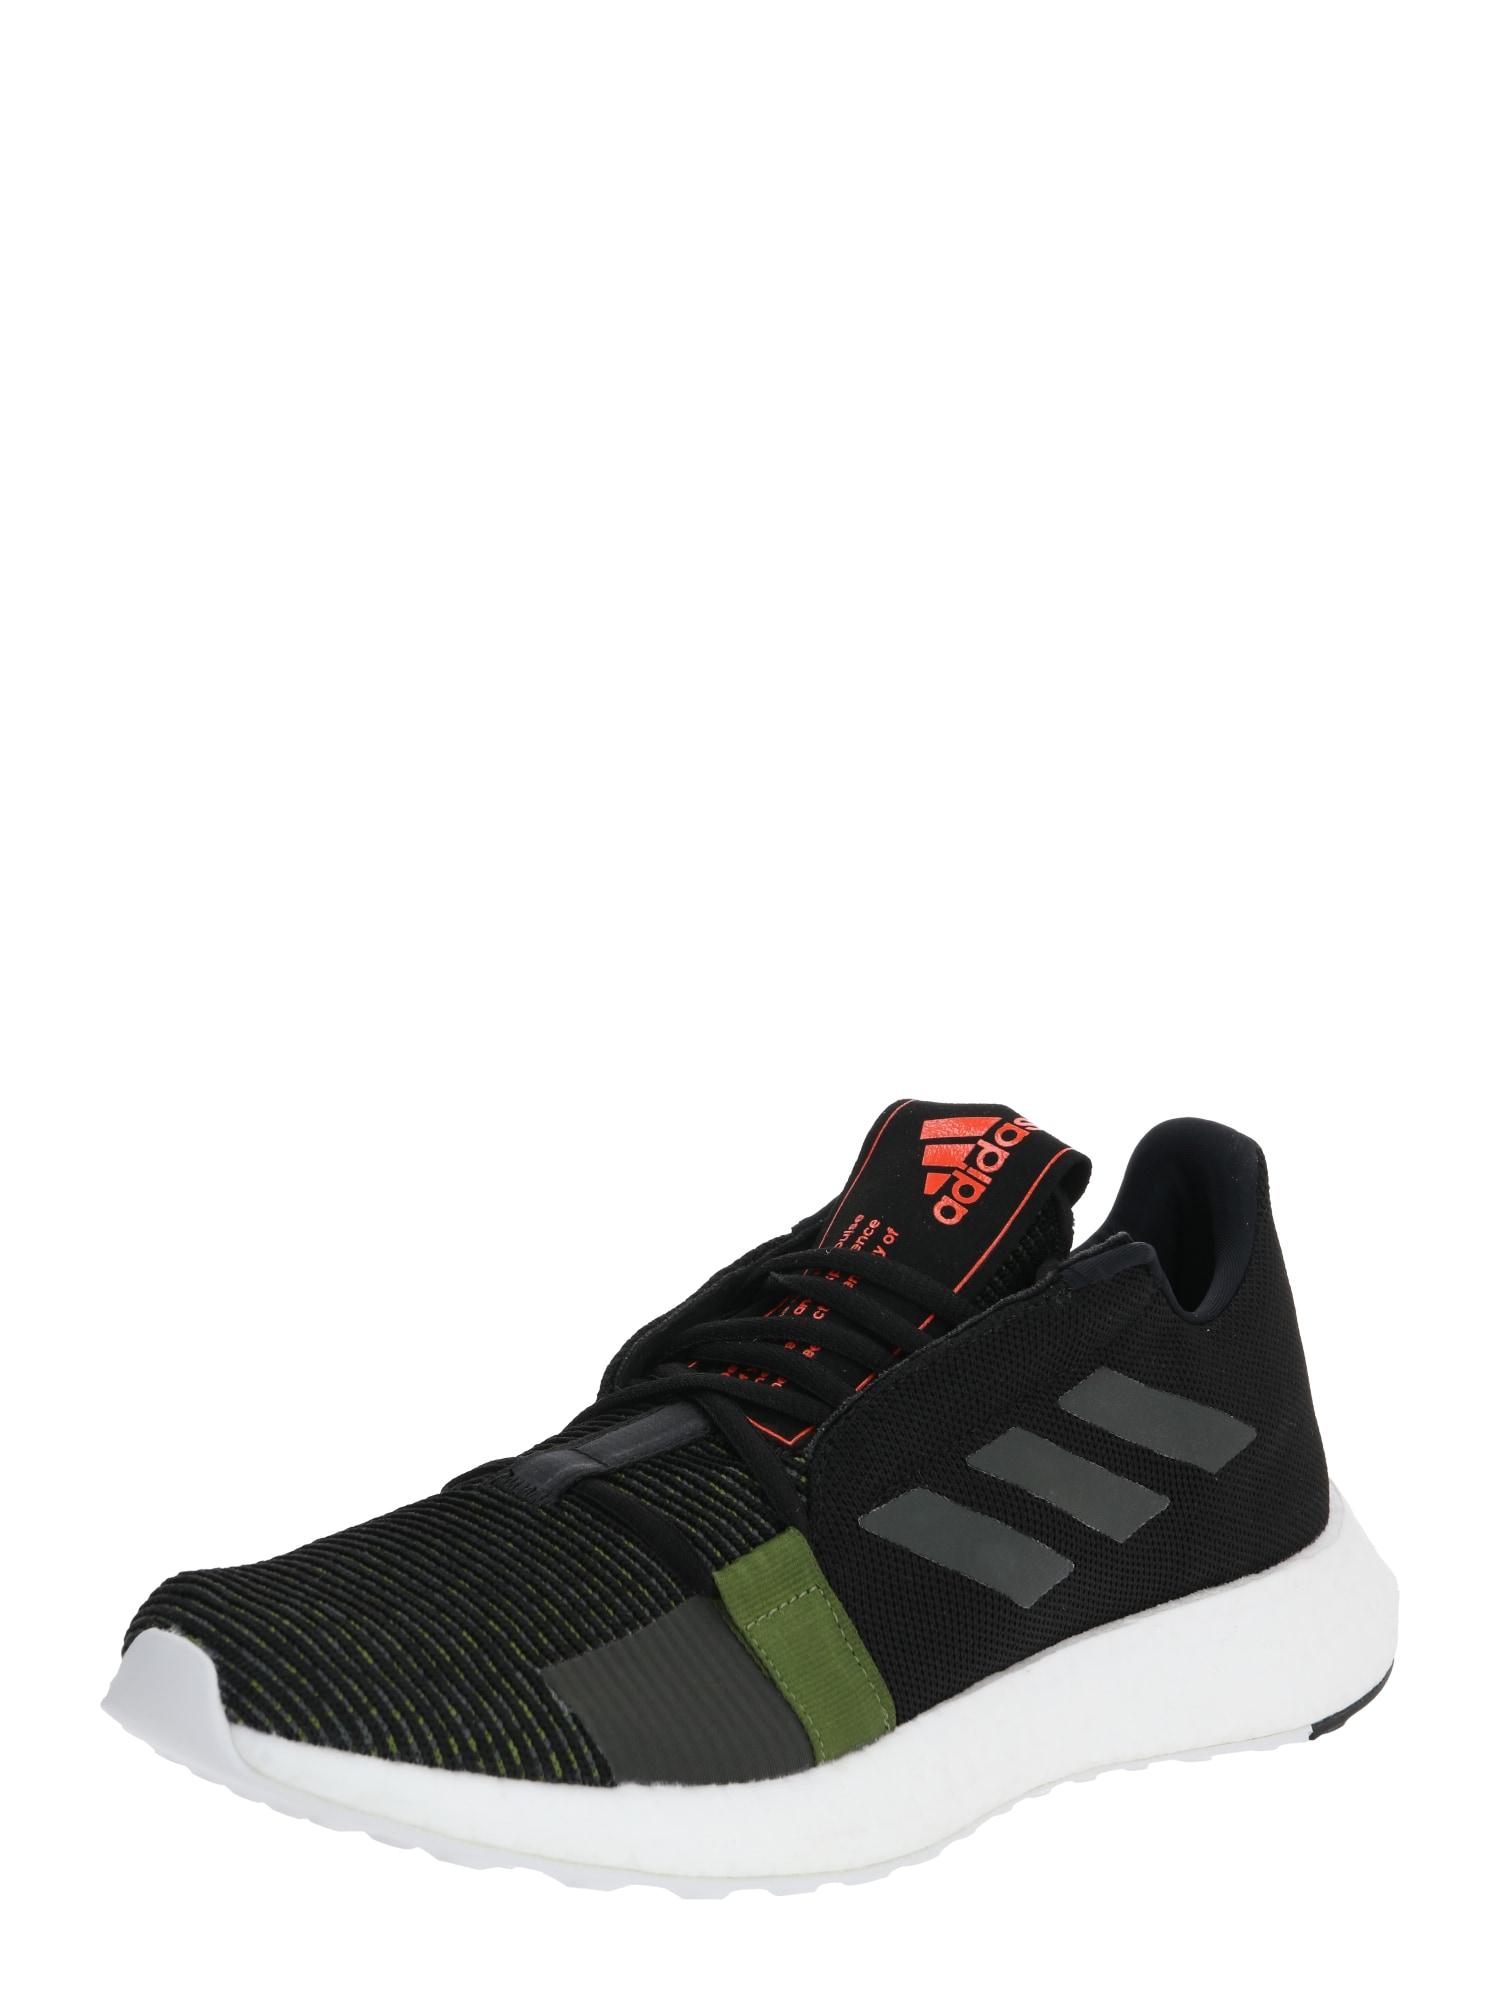 ADIDAS PERFORMANCE Bėgimo batai 'Sense Boost Go' juoda / pilka